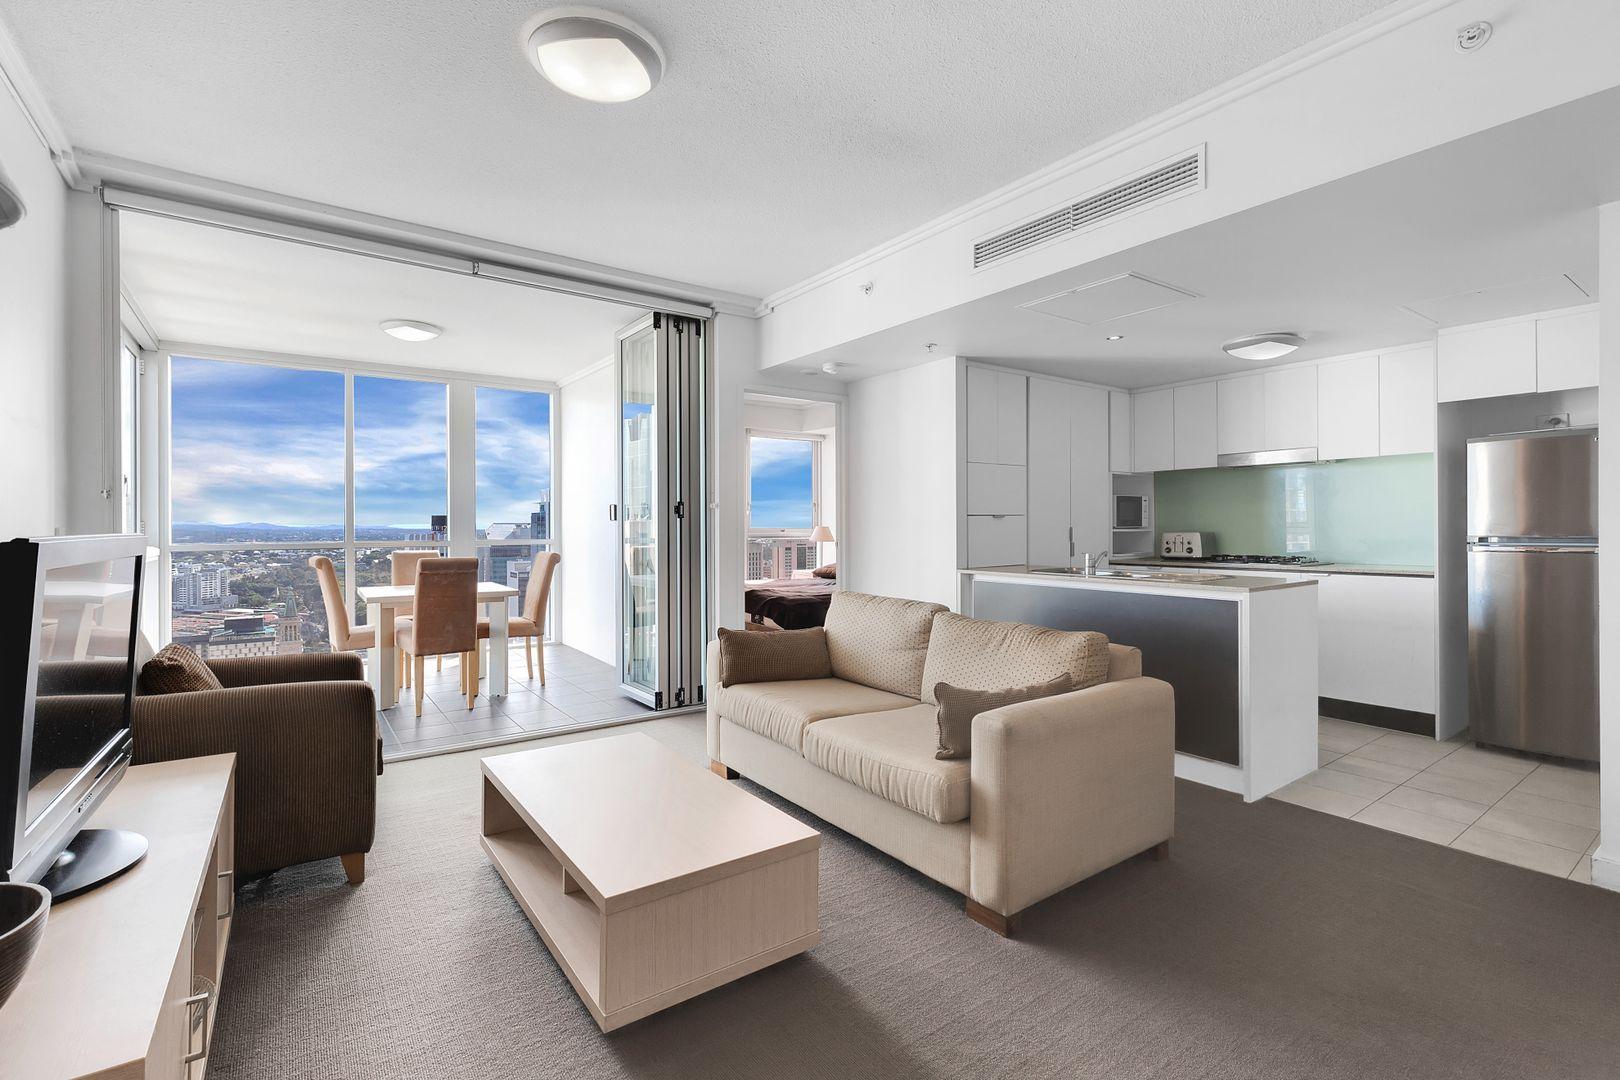 2 bedrooms Apartment / Unit / Flat in 4003/108 Albert St BRISBANE CITY QLD, 4000